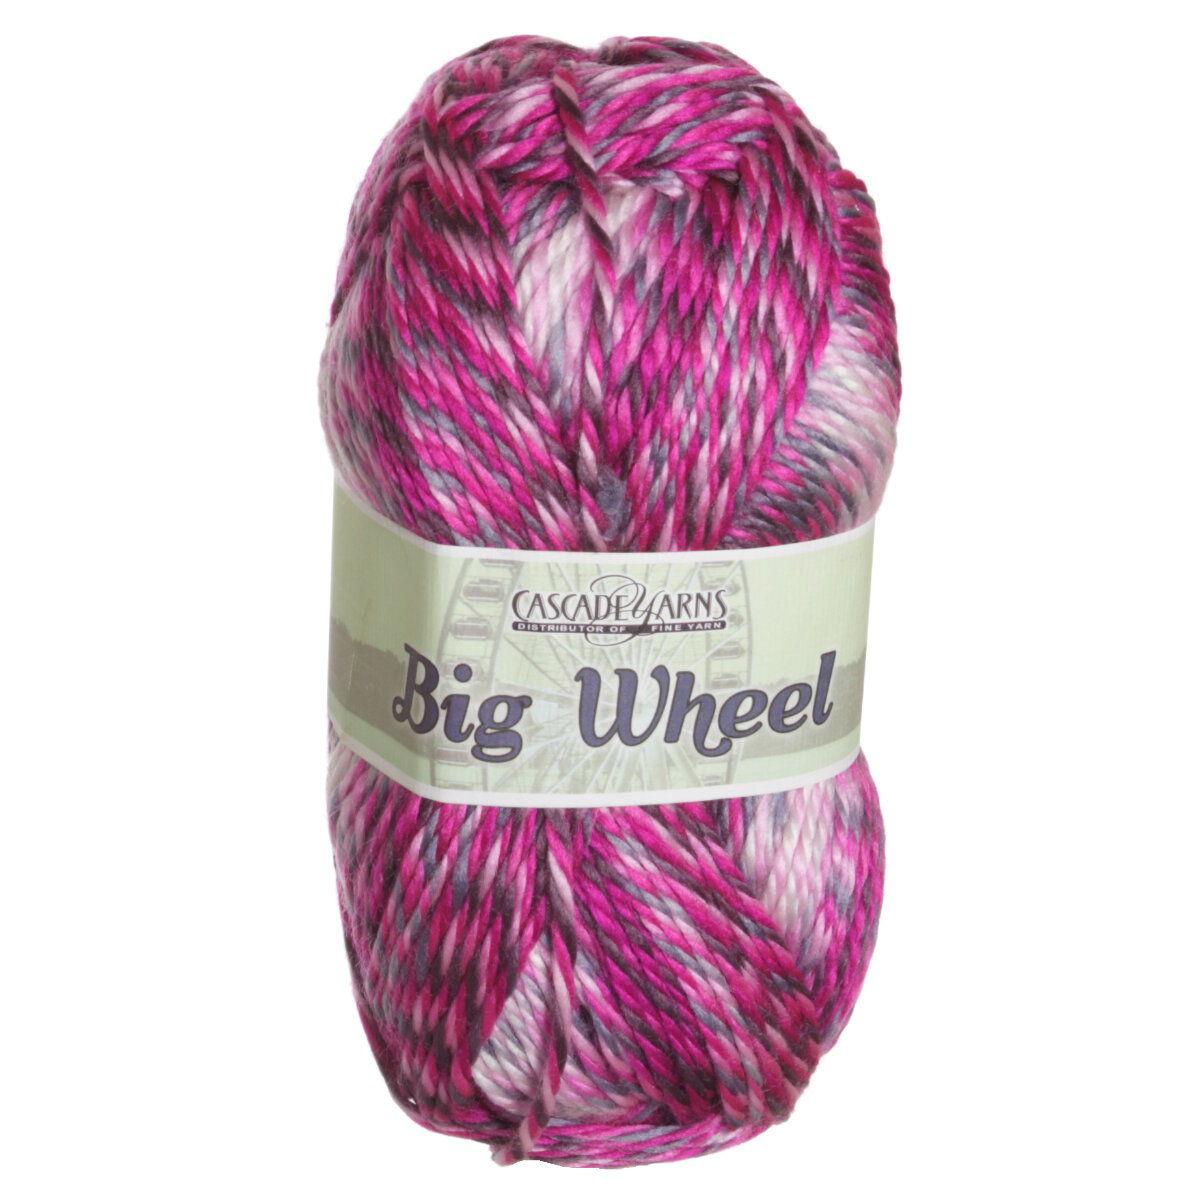 Knitting Wheel Projects : Cascade big wheel yarn los angeles project ideas at